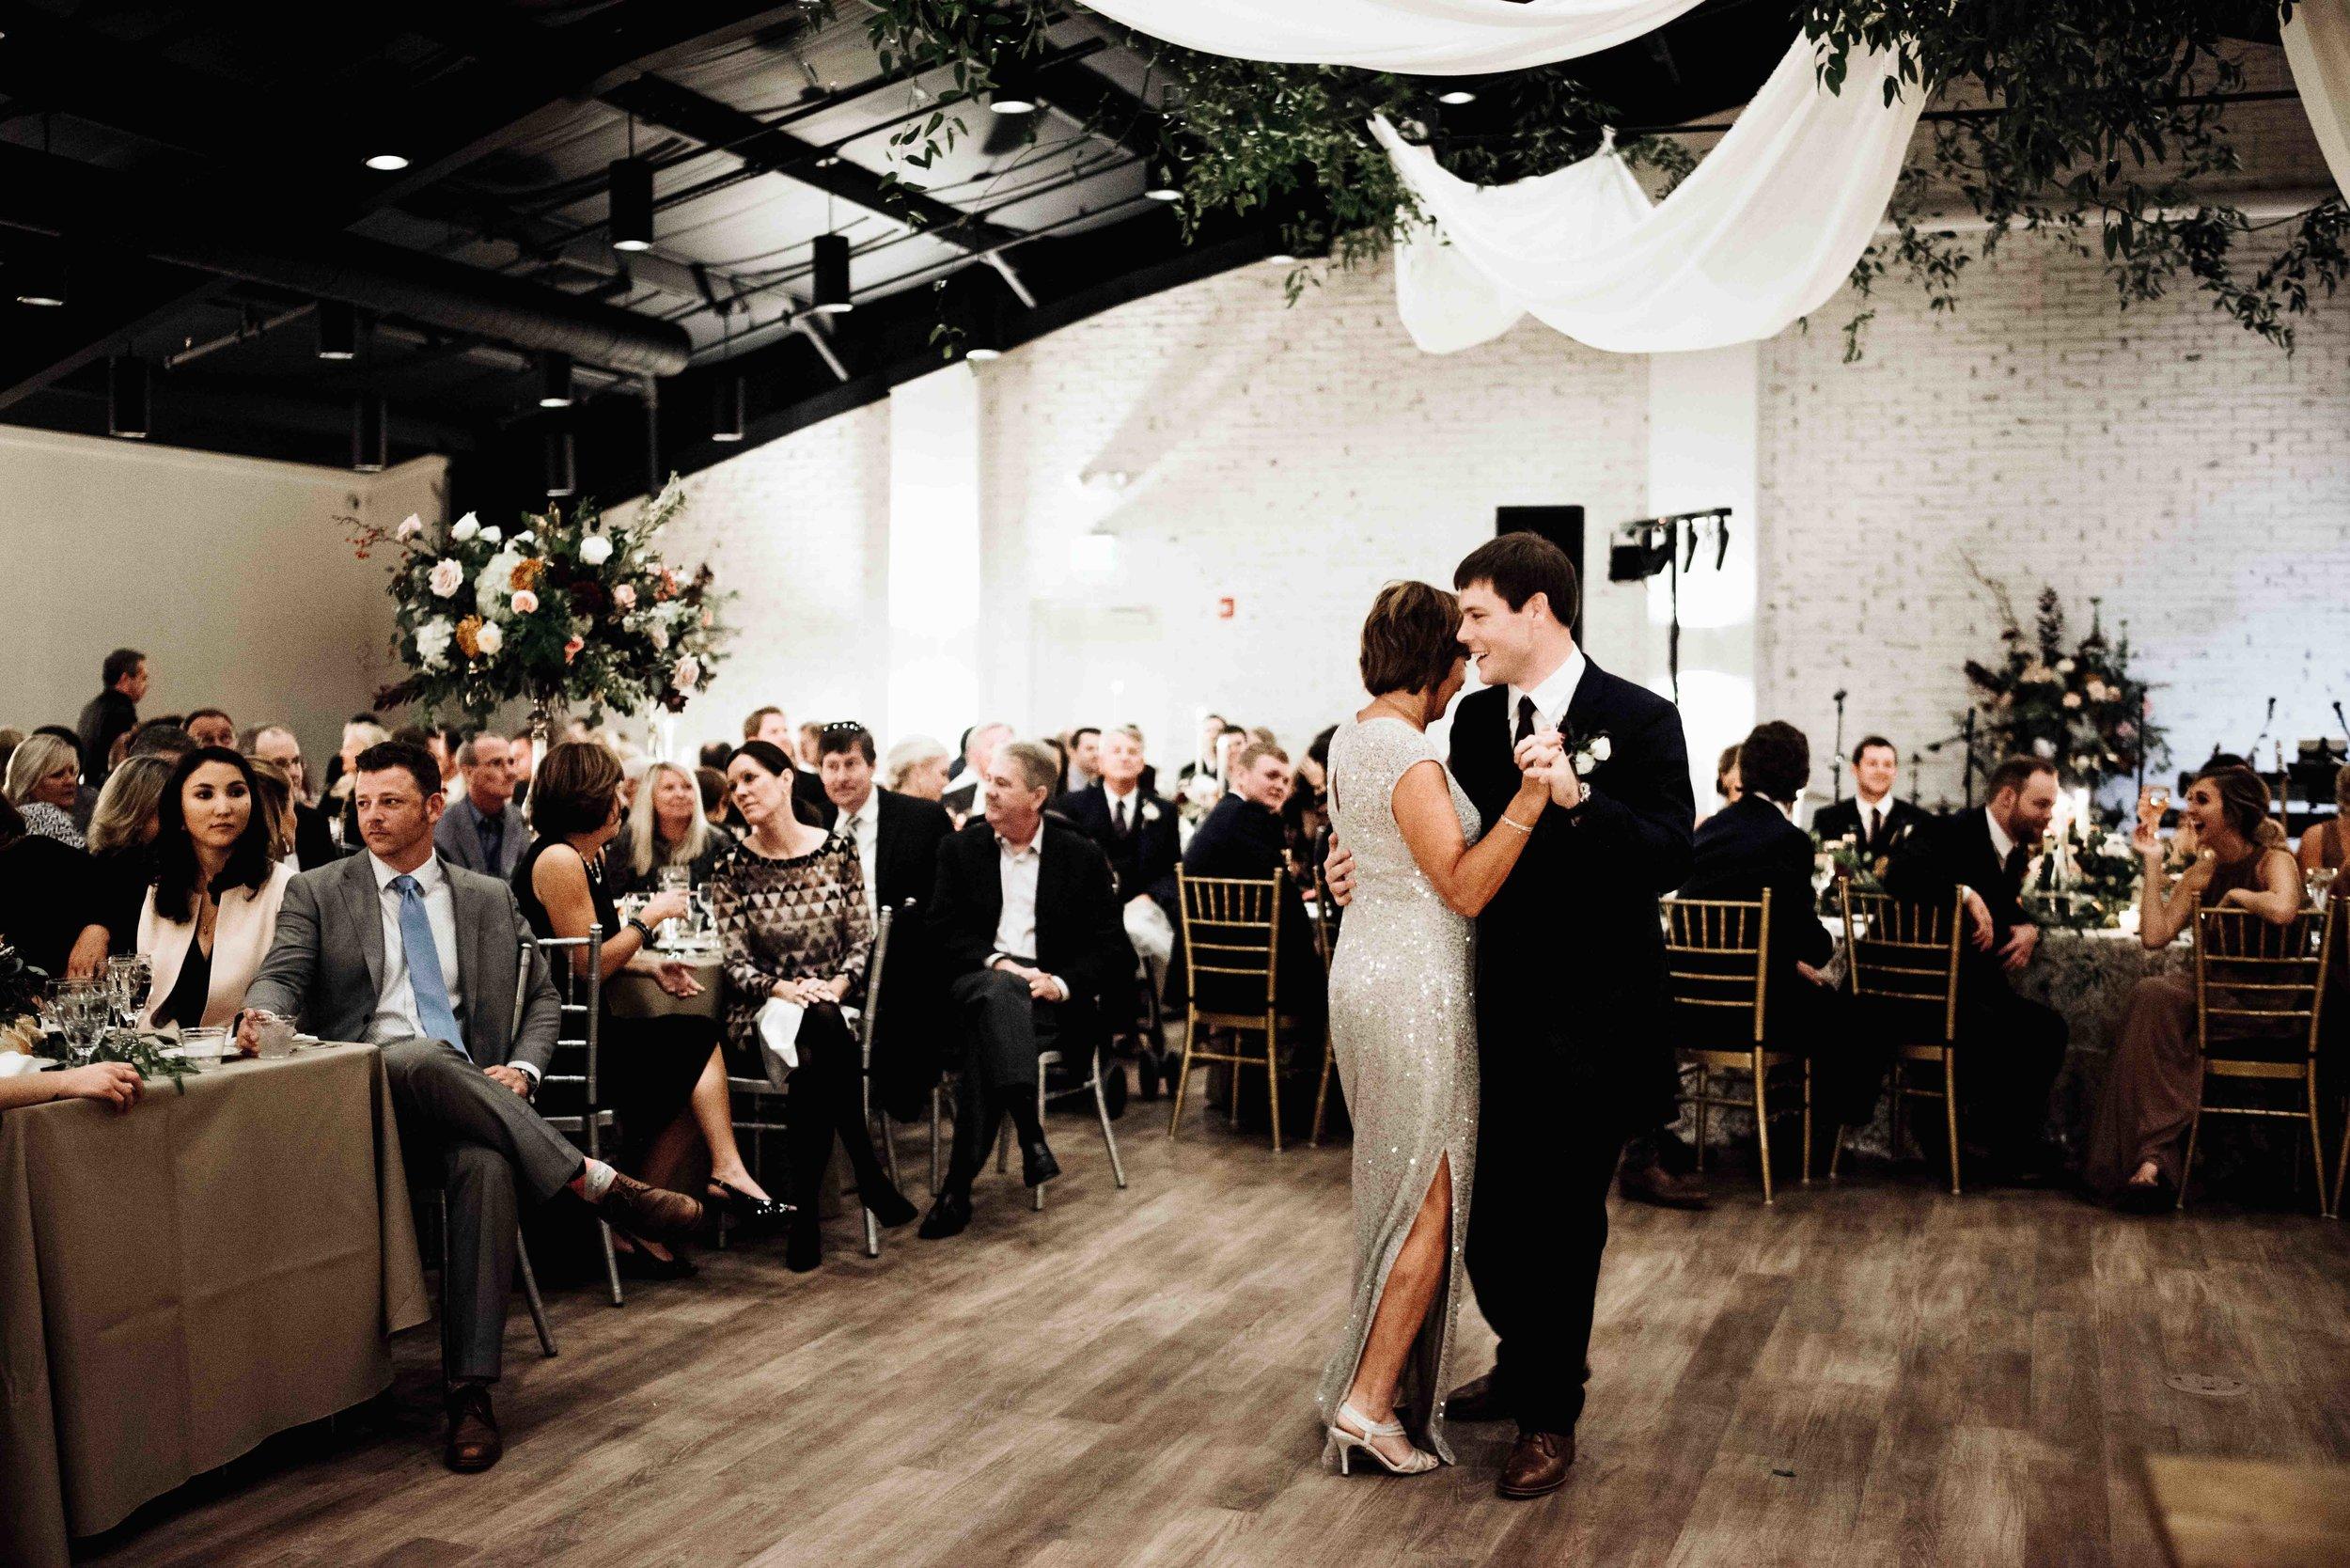 Carlee-Bob-Indianapolis-Wedding-Blog-97.jpg